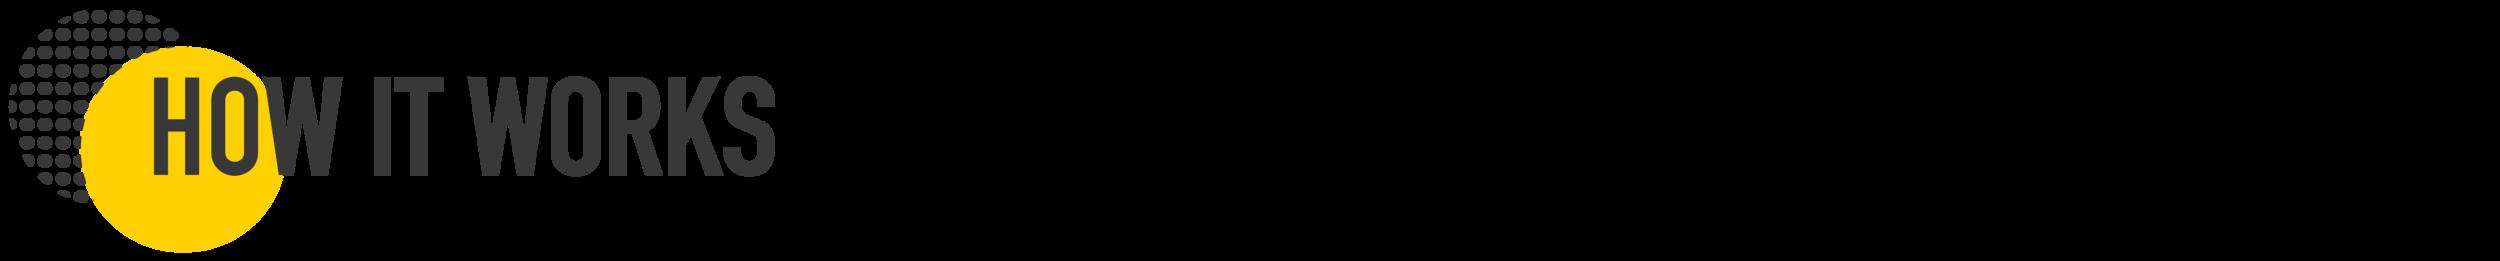 1st Backer Web TITLE-03.png